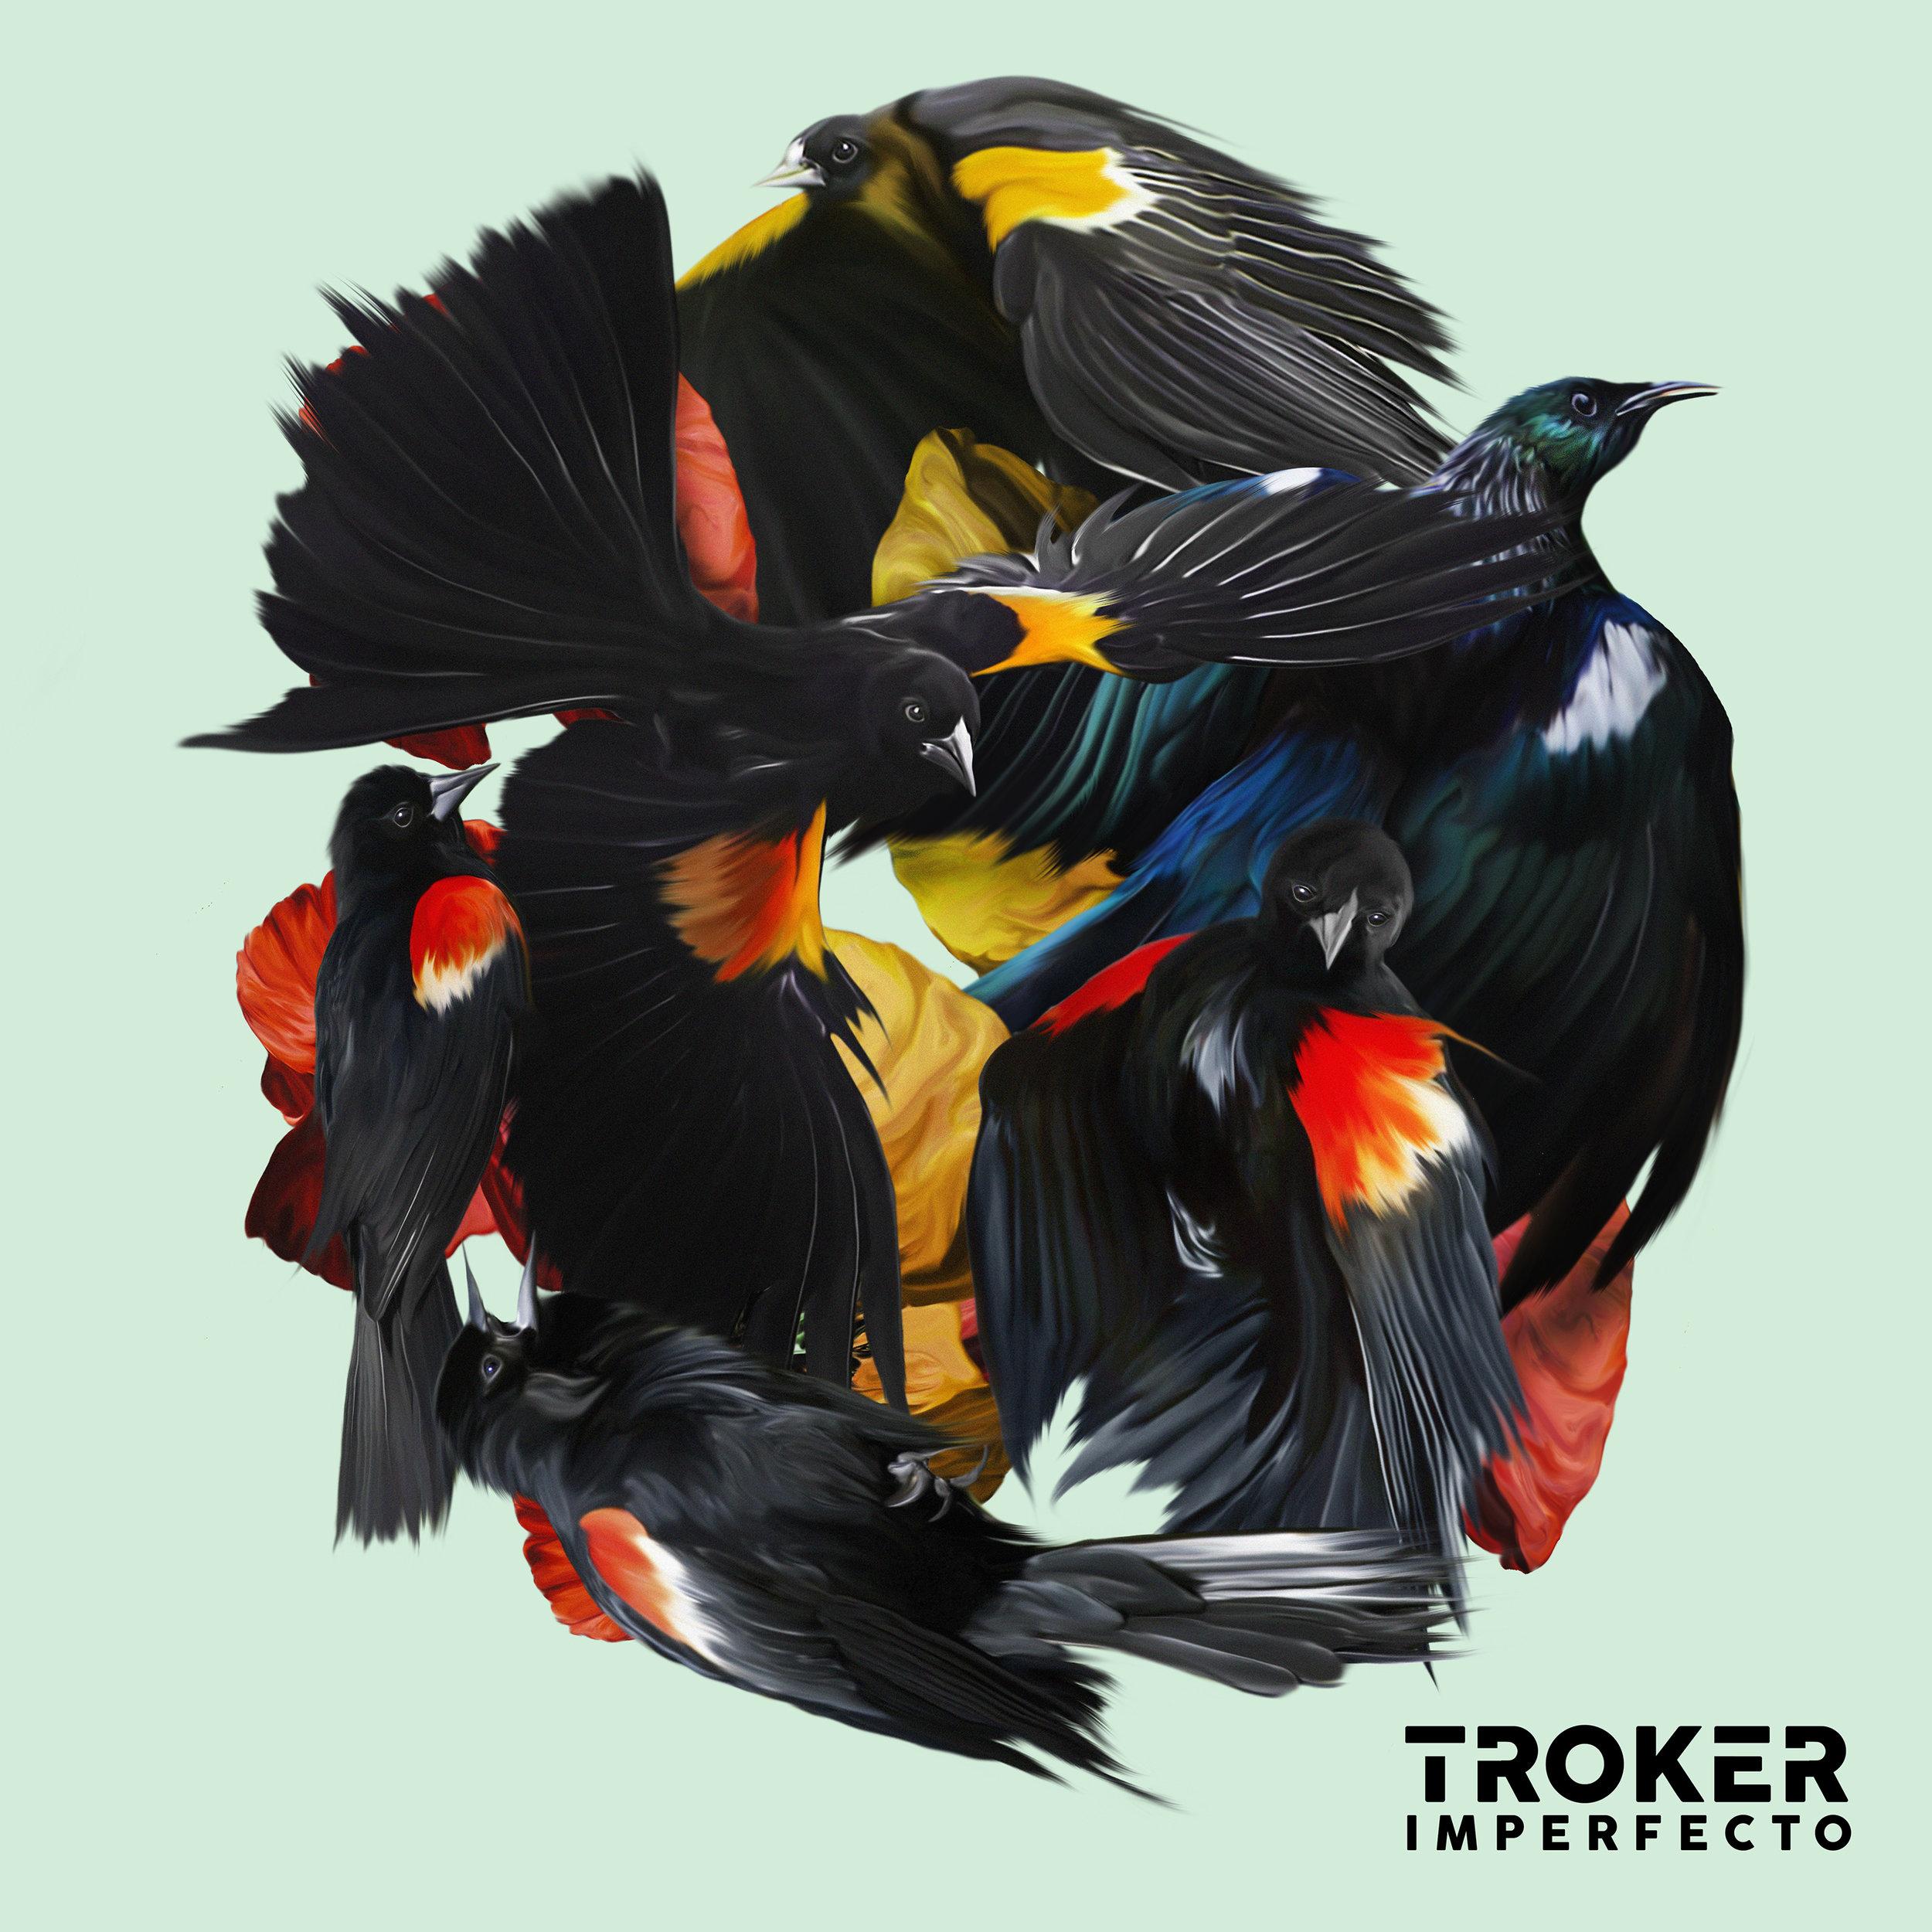 TROKER_DIGITAL FINAL ART (1).jpg